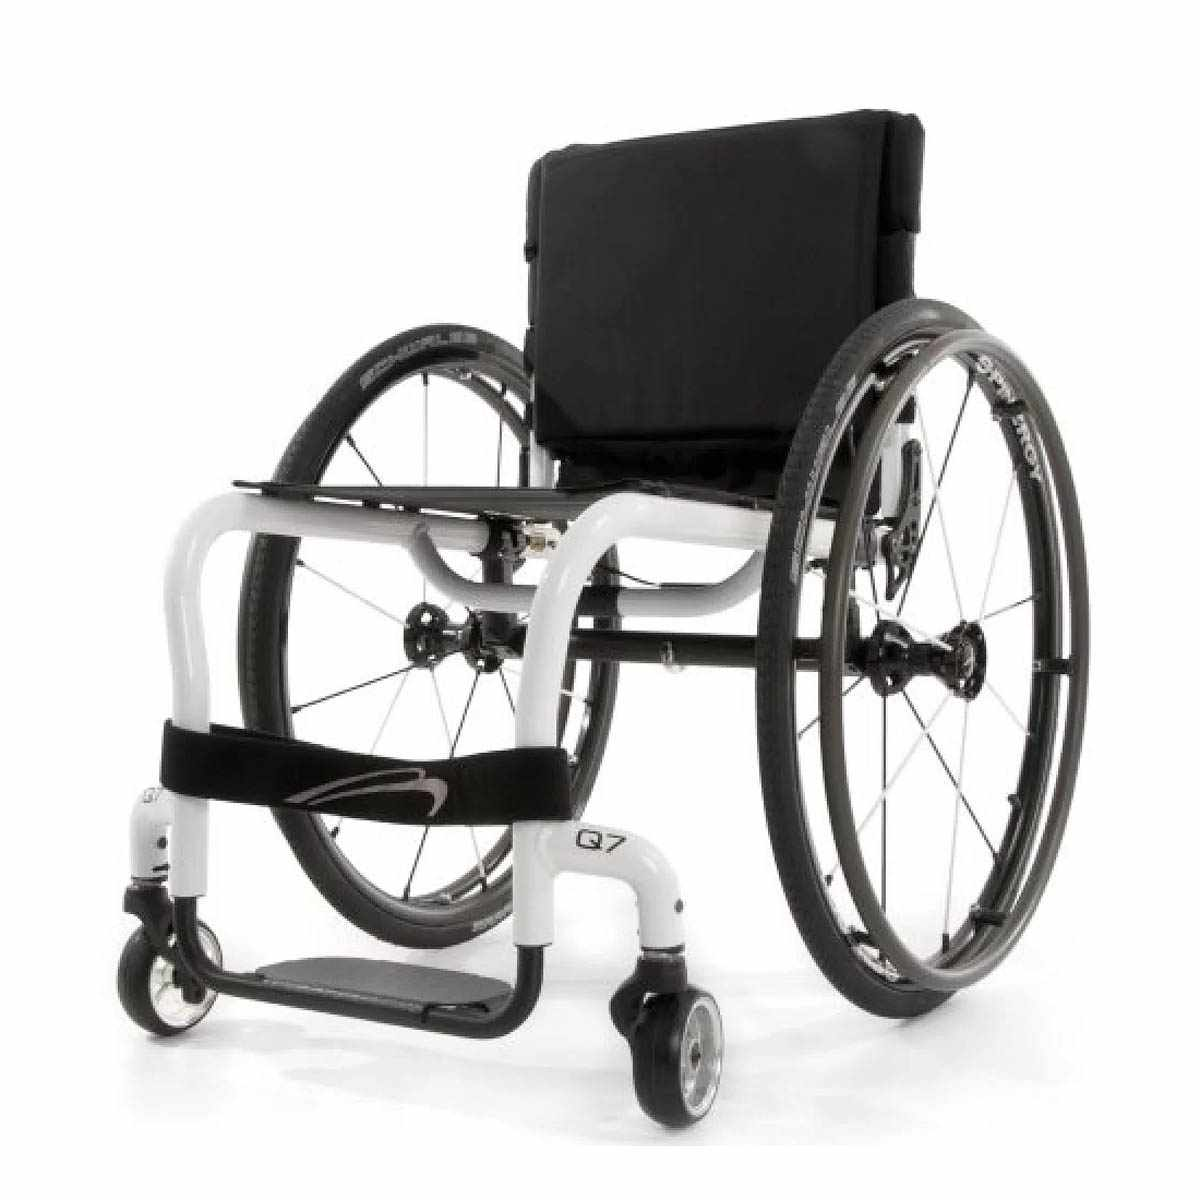 Quickie Q7 NextGEN ultralight rigid manual wheelchair